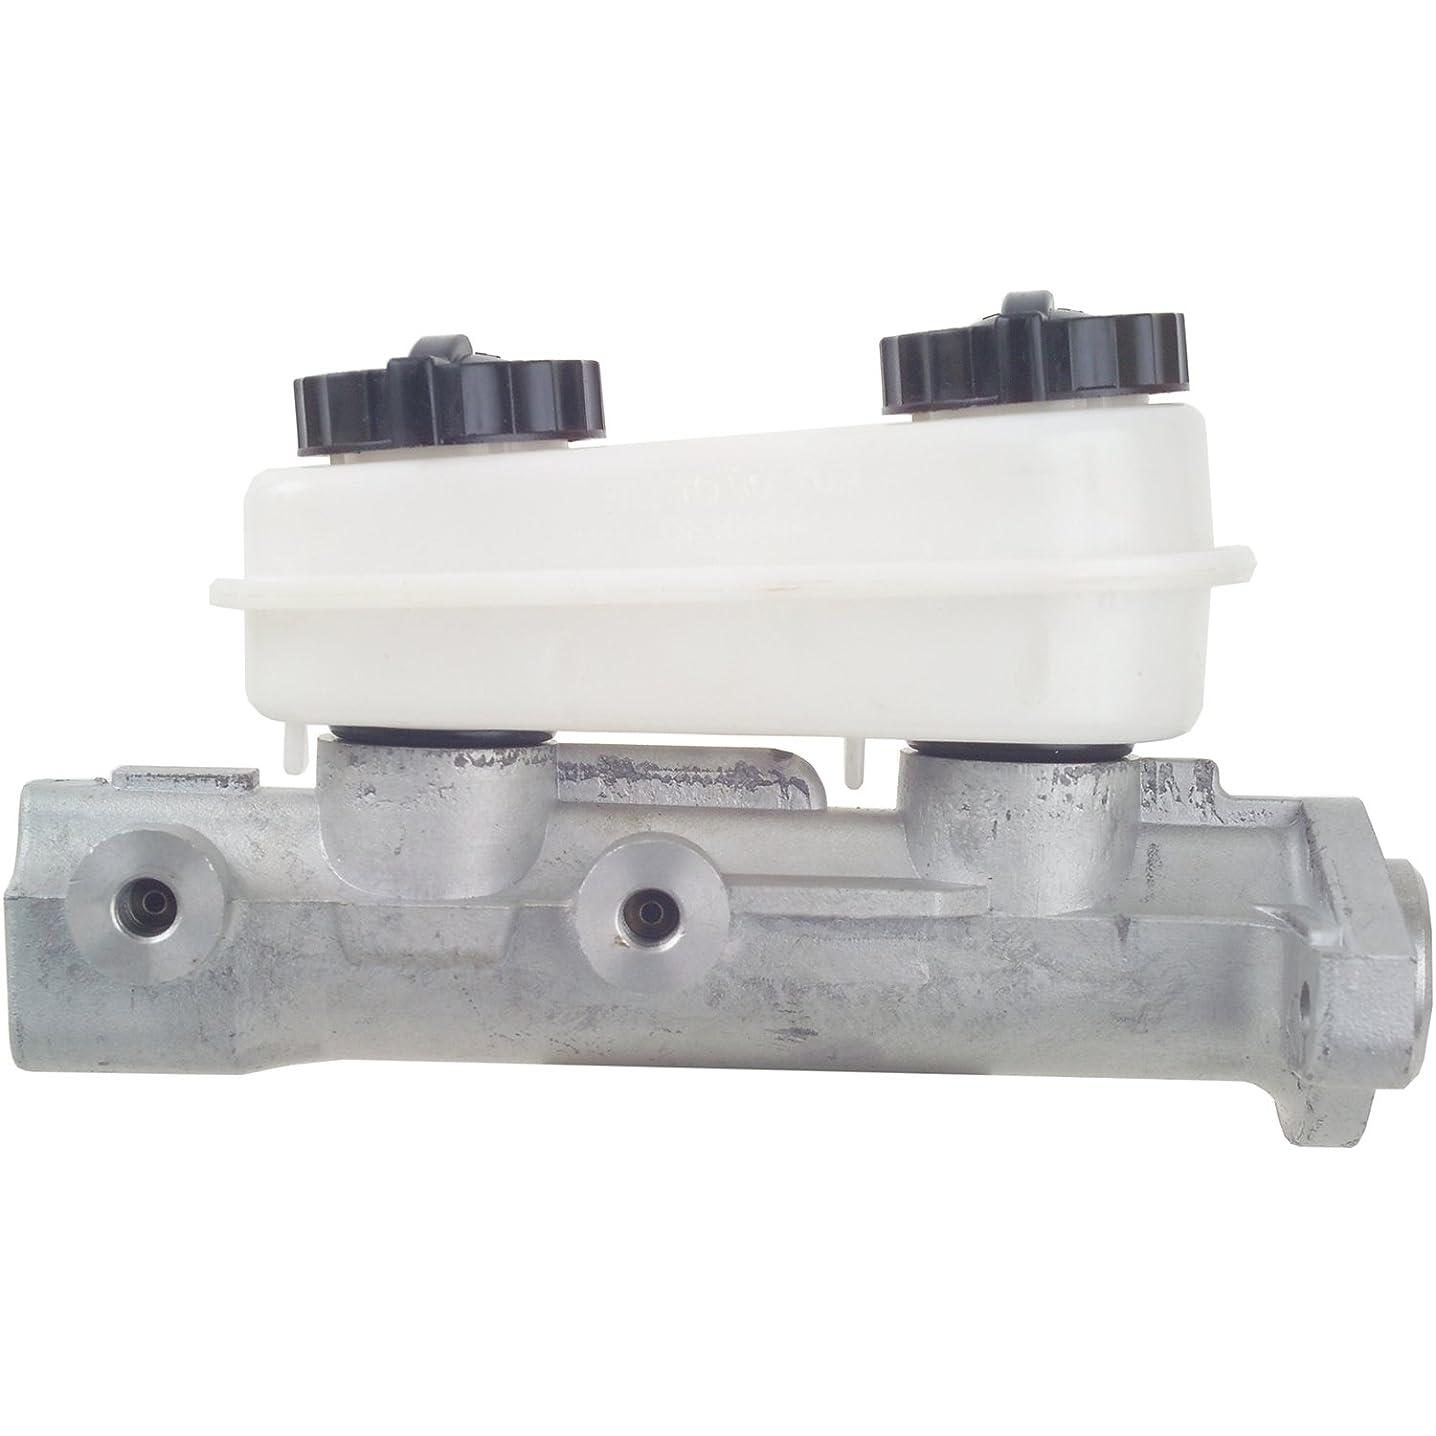 Cardone Select 13-1983 New Brake Master Cylinder